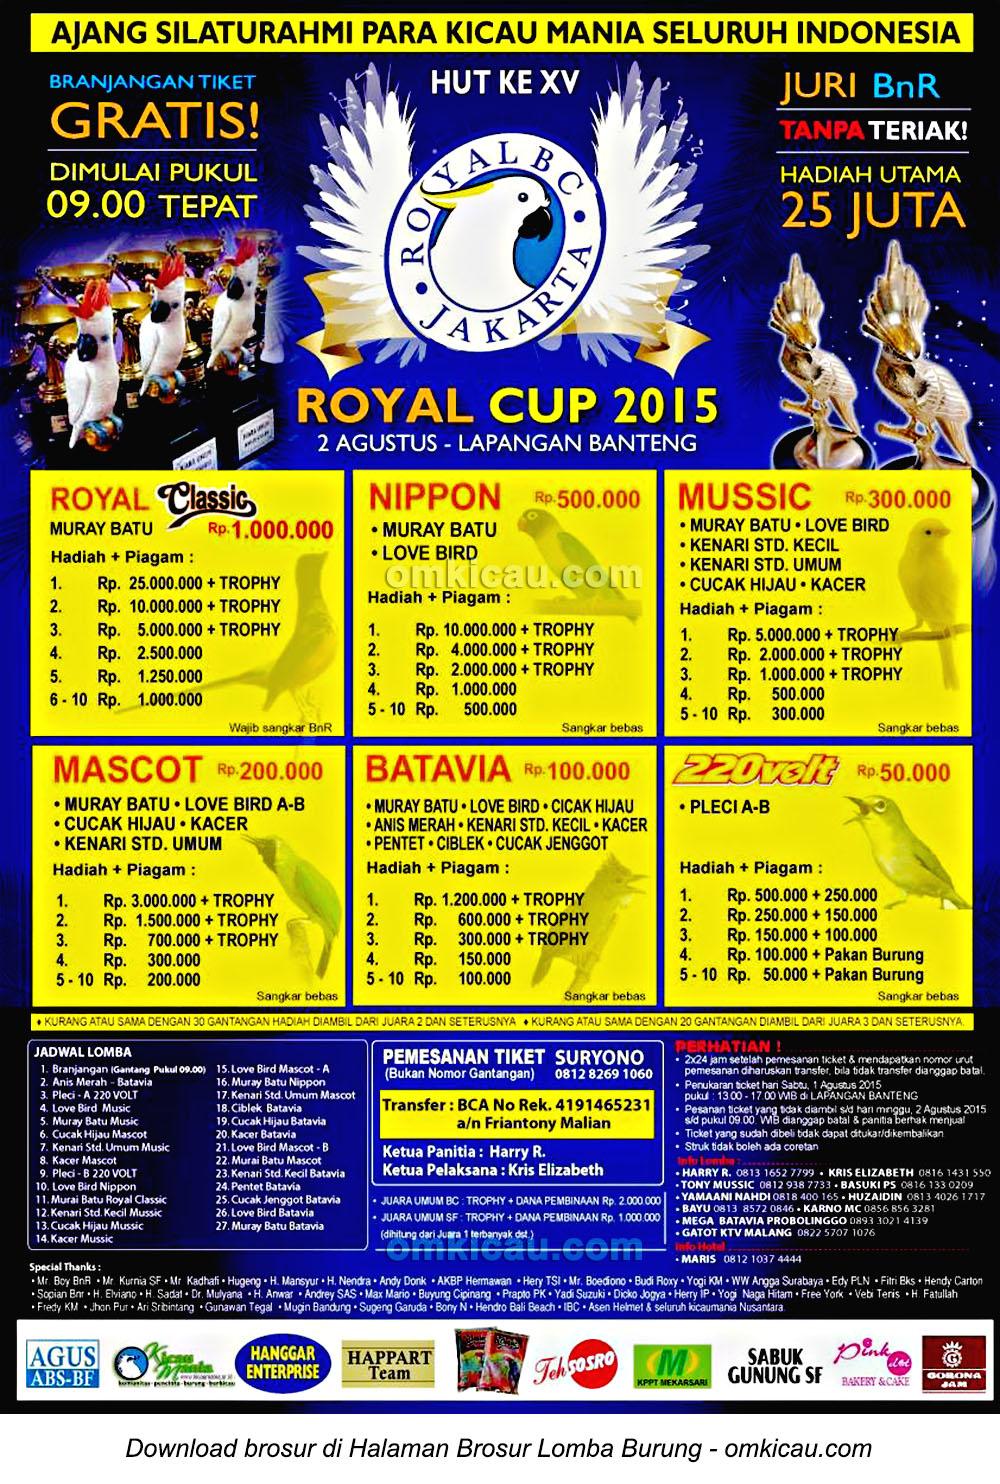 Brosur Lomba Burung Berkicau Royal Cup 2015, Jakarta, 2 Agustus 2015